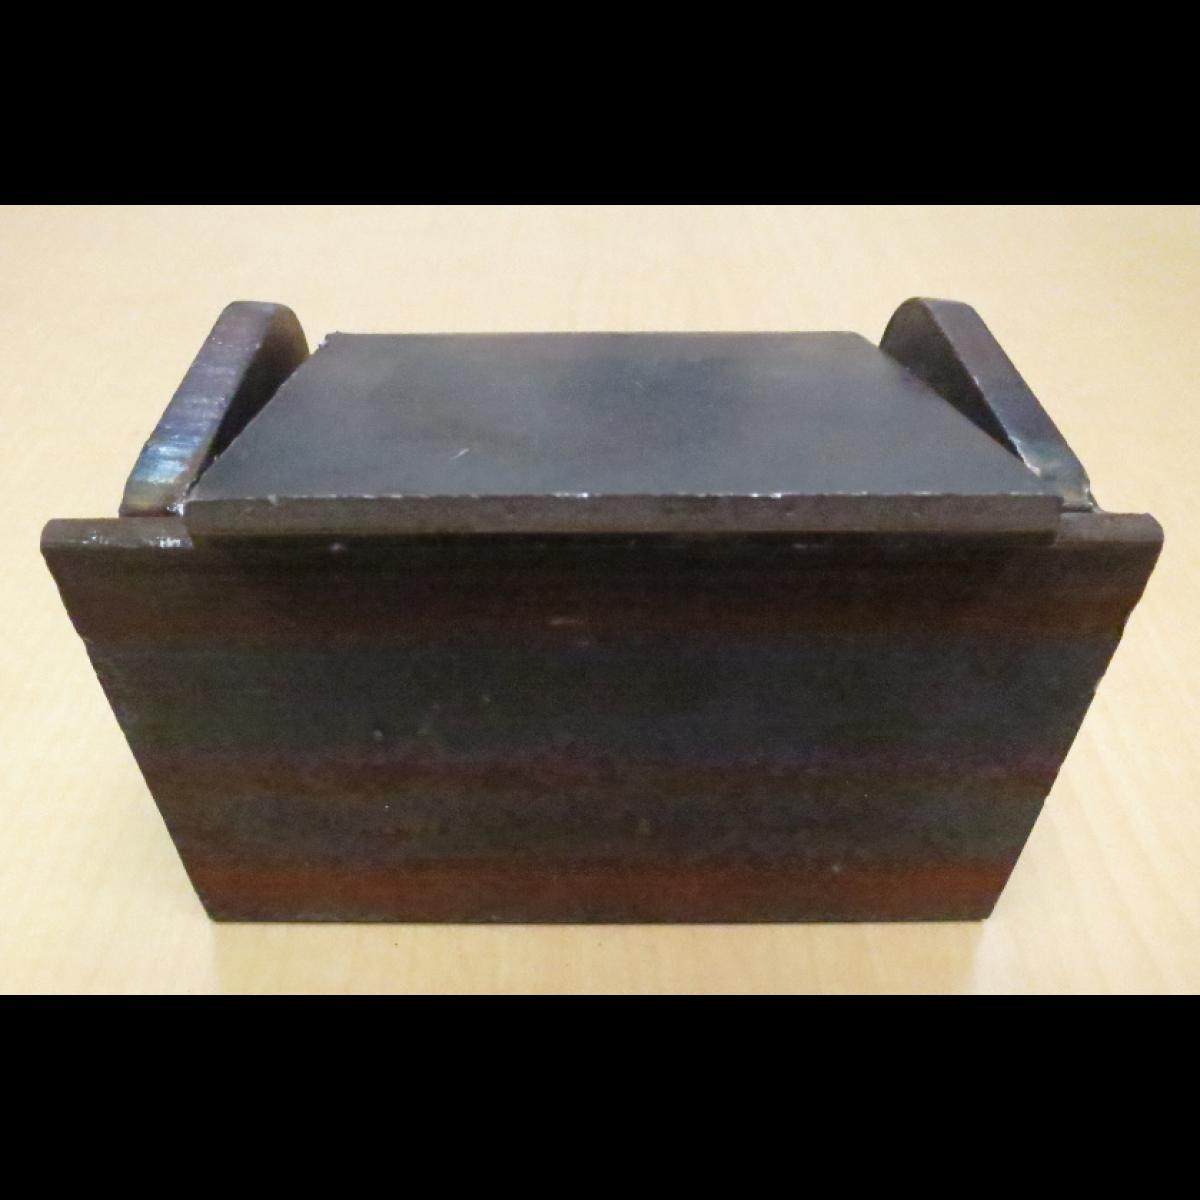 Dump Bed Tailgate Hinge Removable Pin : Dump body hinge kit bing images